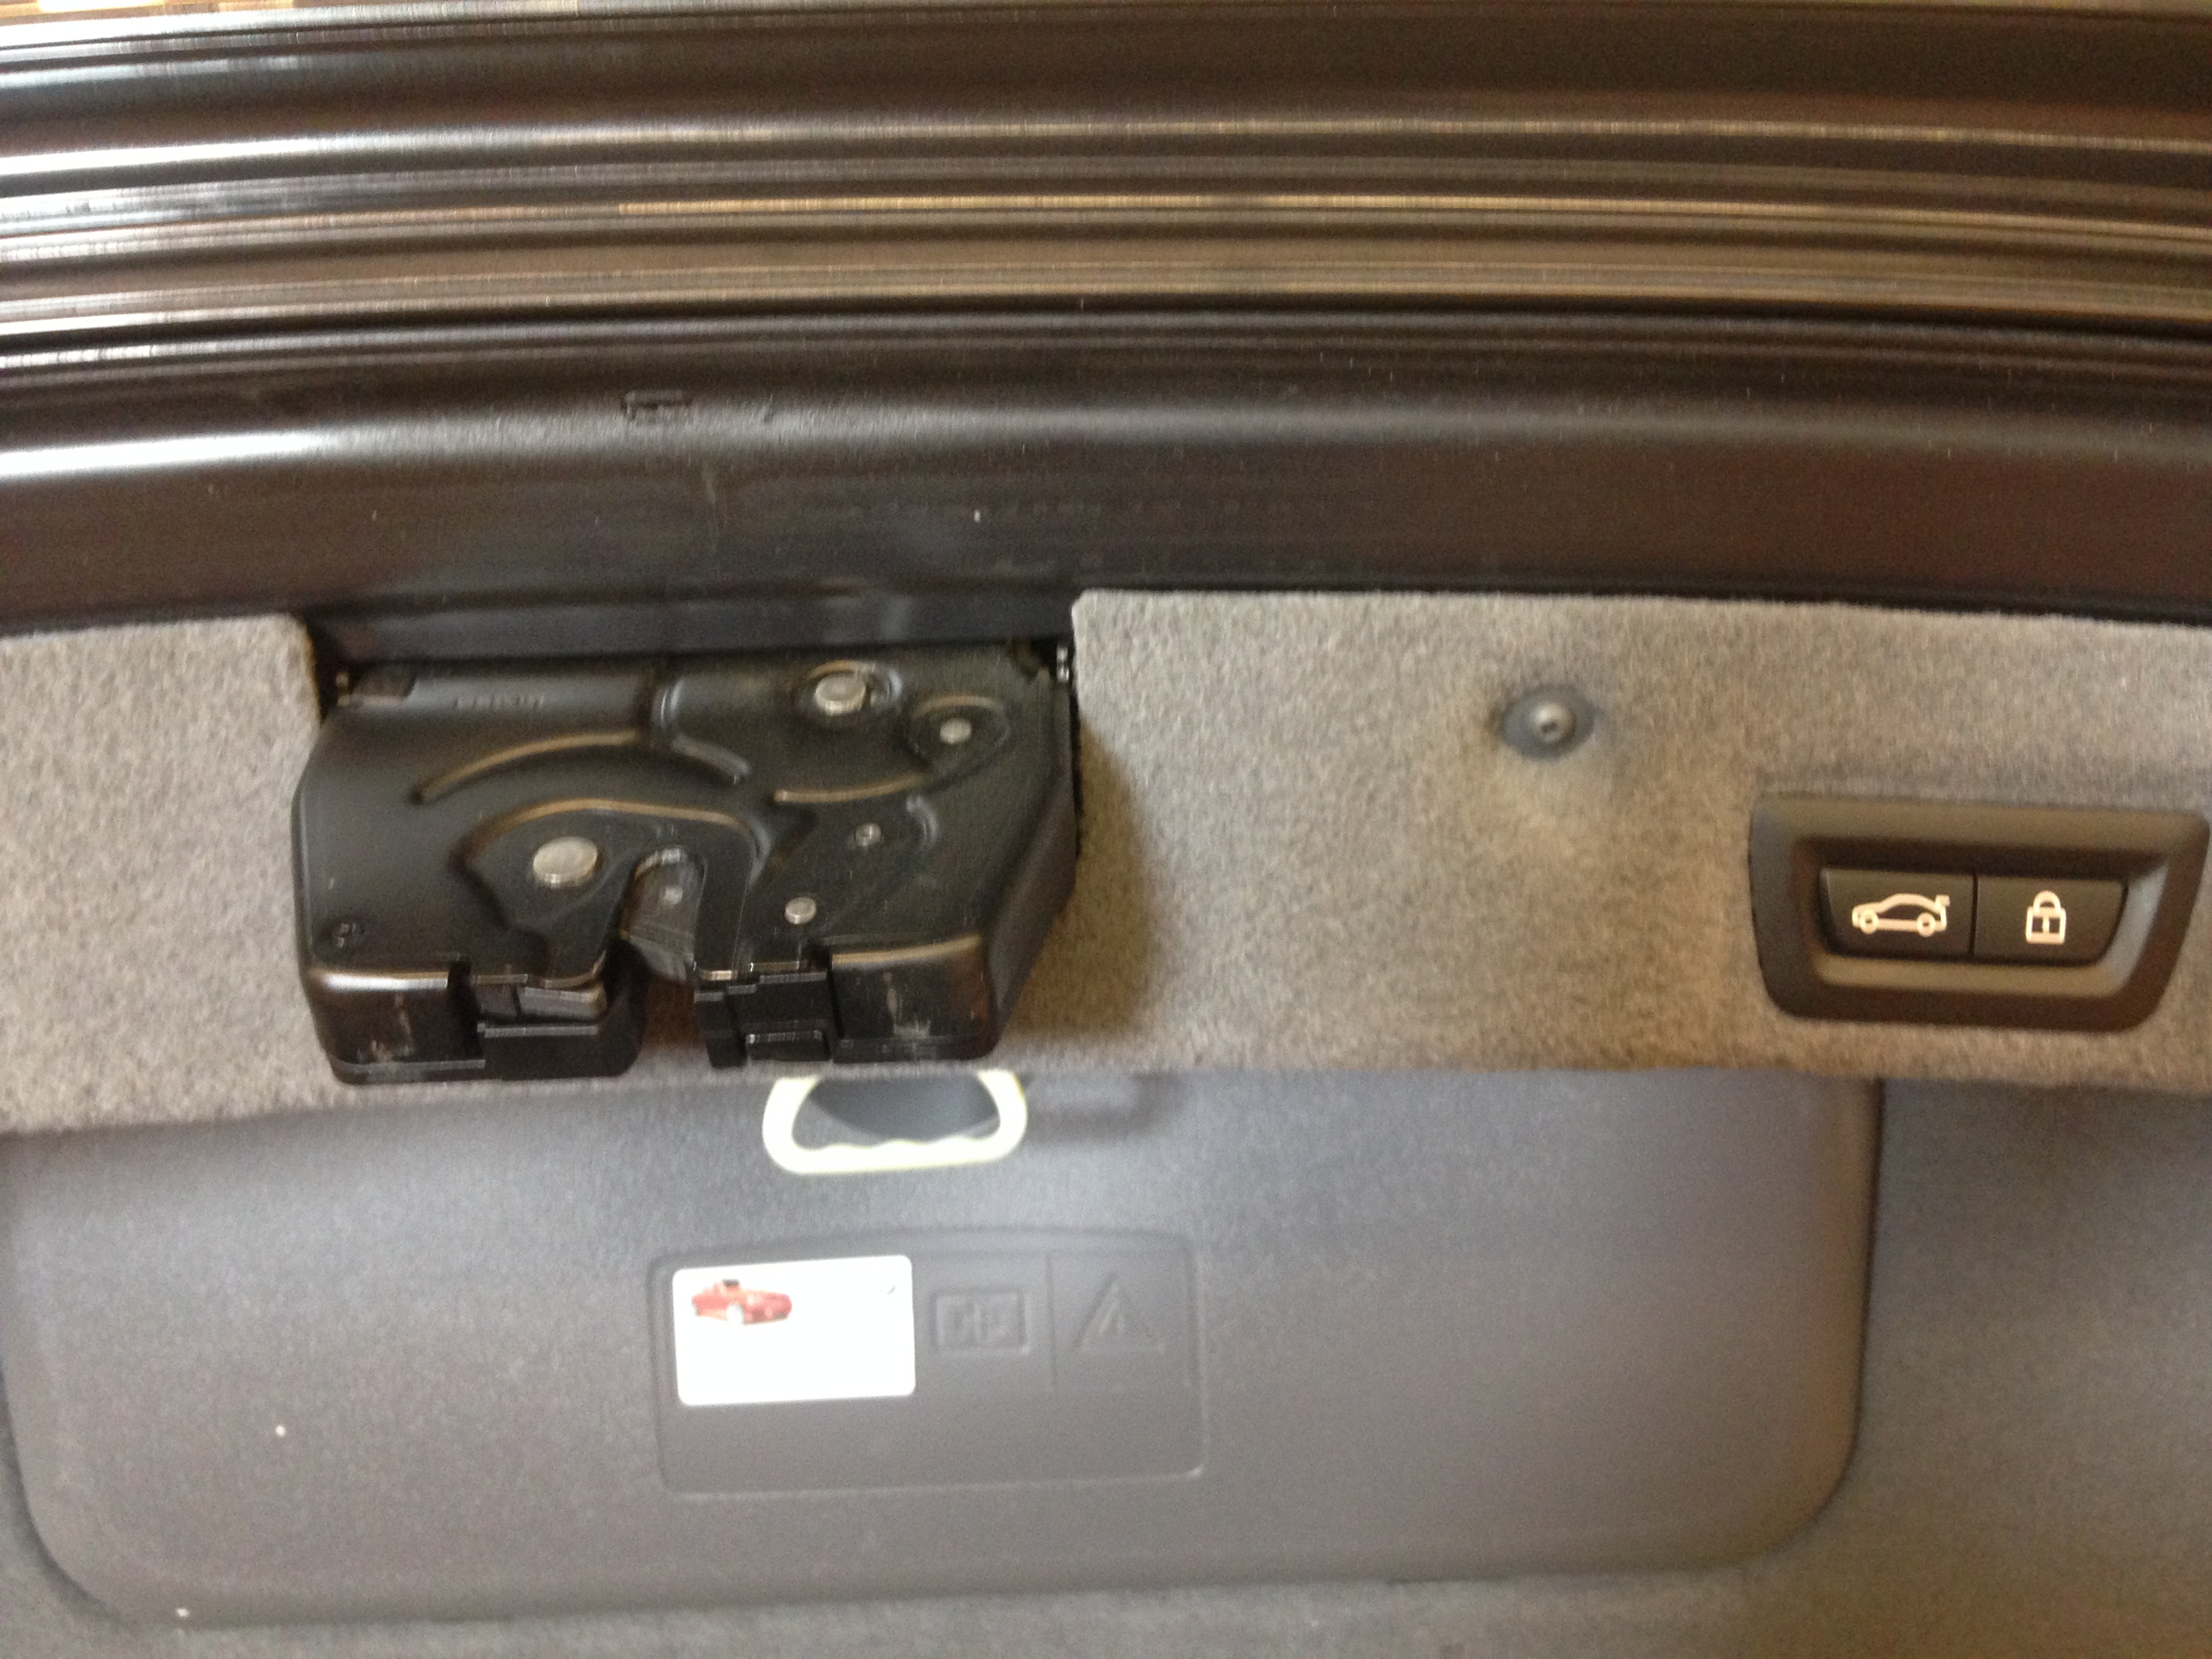 Car Headlight Wiring Diagram Get Free Image About Wiring Diagram